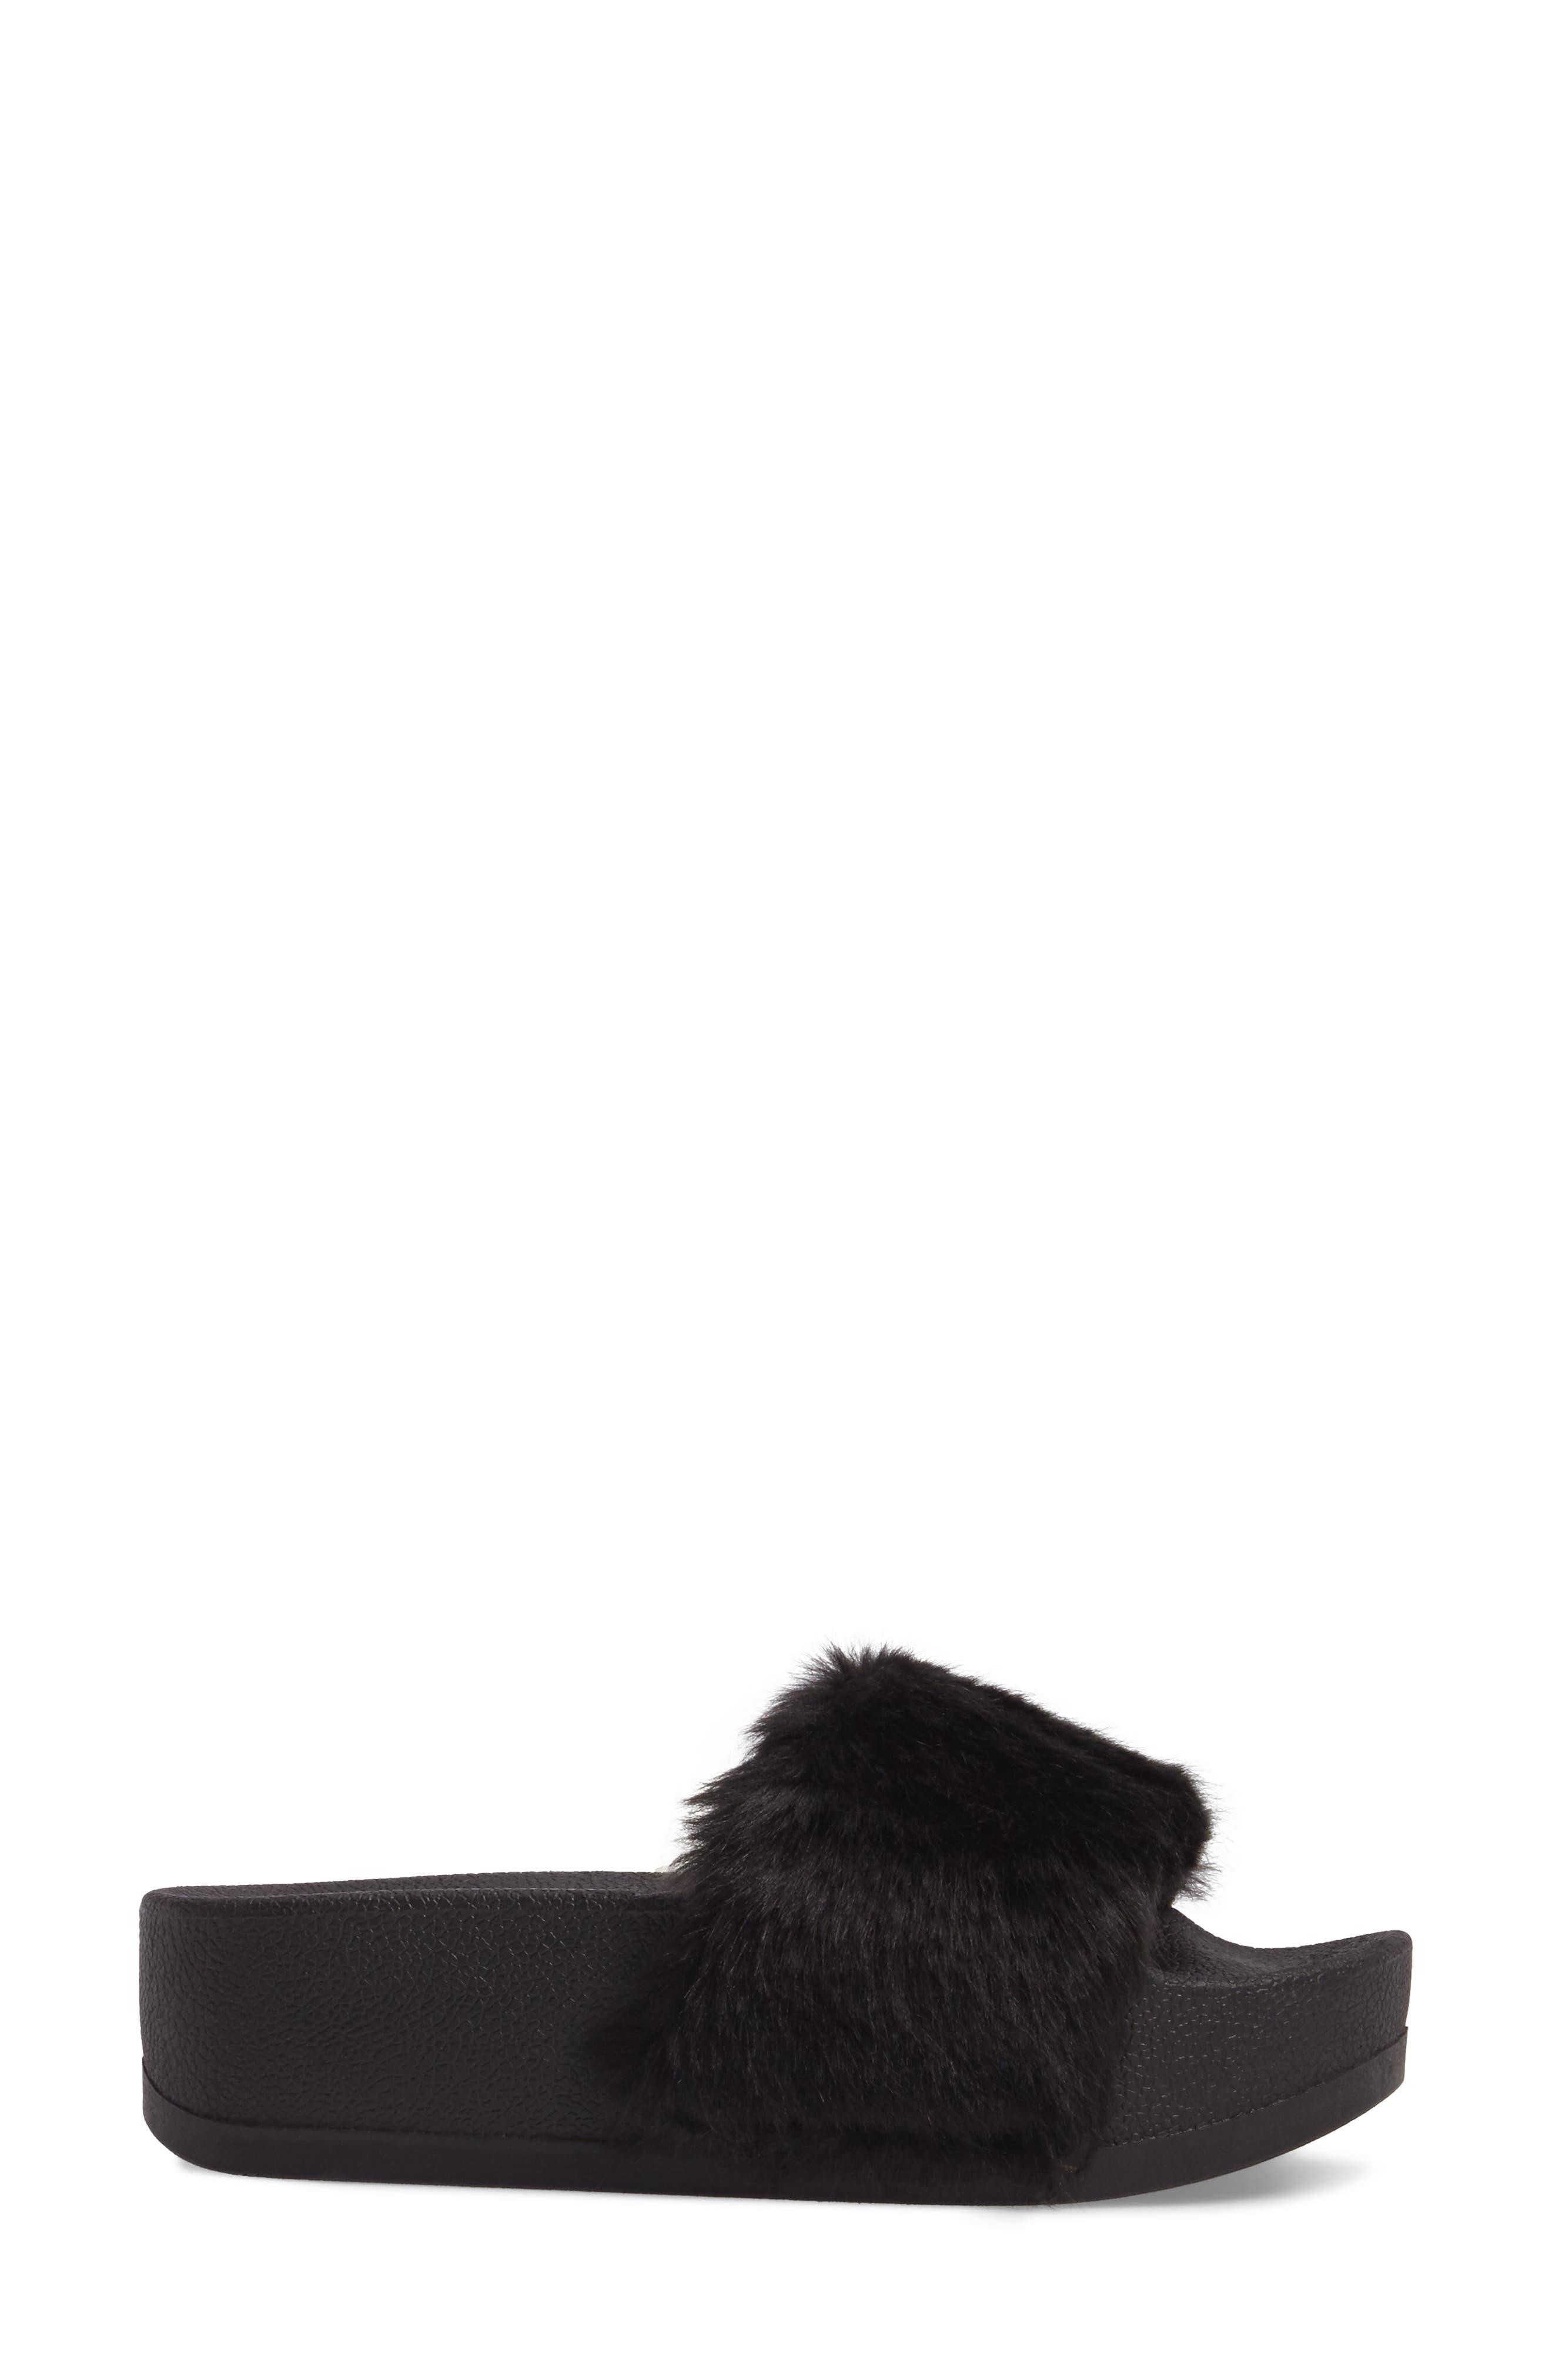 Softey Faux Fur Platform Slide,                             Alternate thumbnail 3, color,                             001